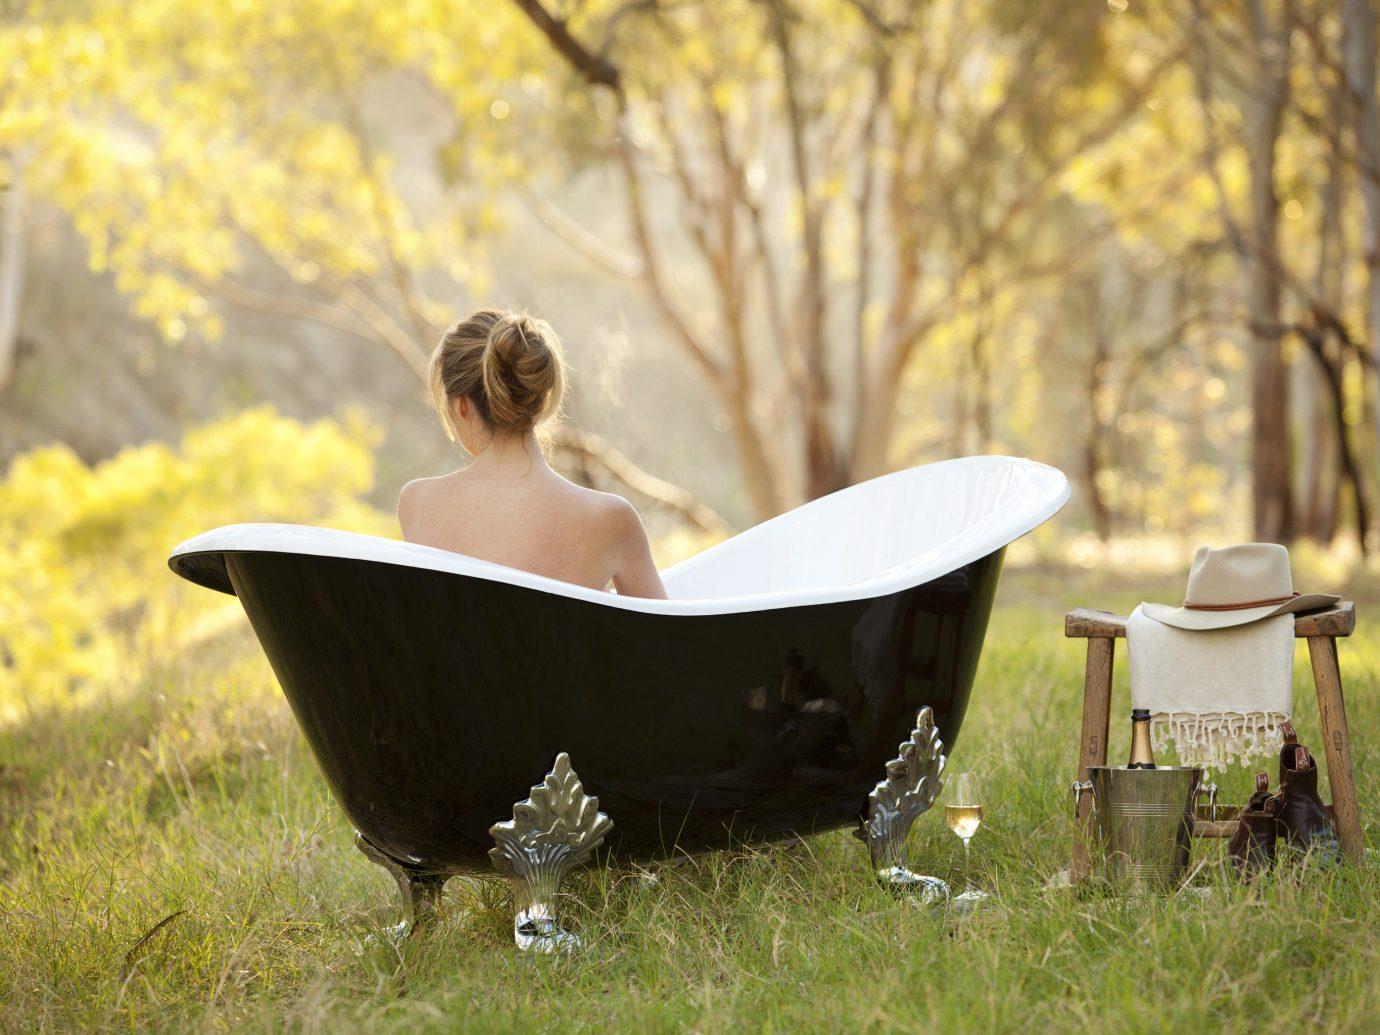 Health + Wellness Hotels Spa Retreats grass tree outdoor season lawn morning spring backyard Picnic flower autumn